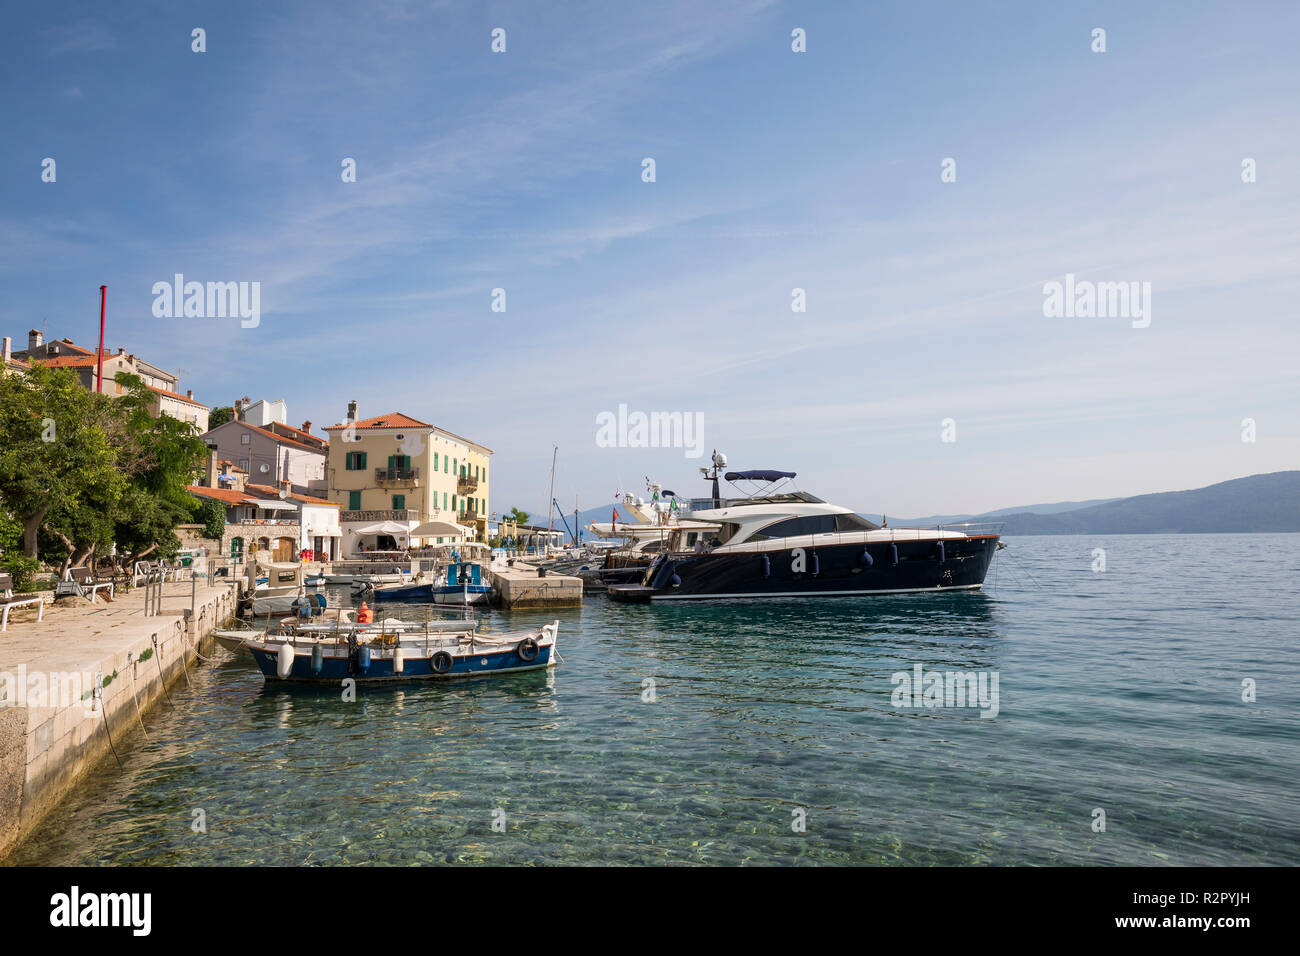 Harbour of Valun, Island of Cres, Kvarner Bay, Croatia Stock Photo